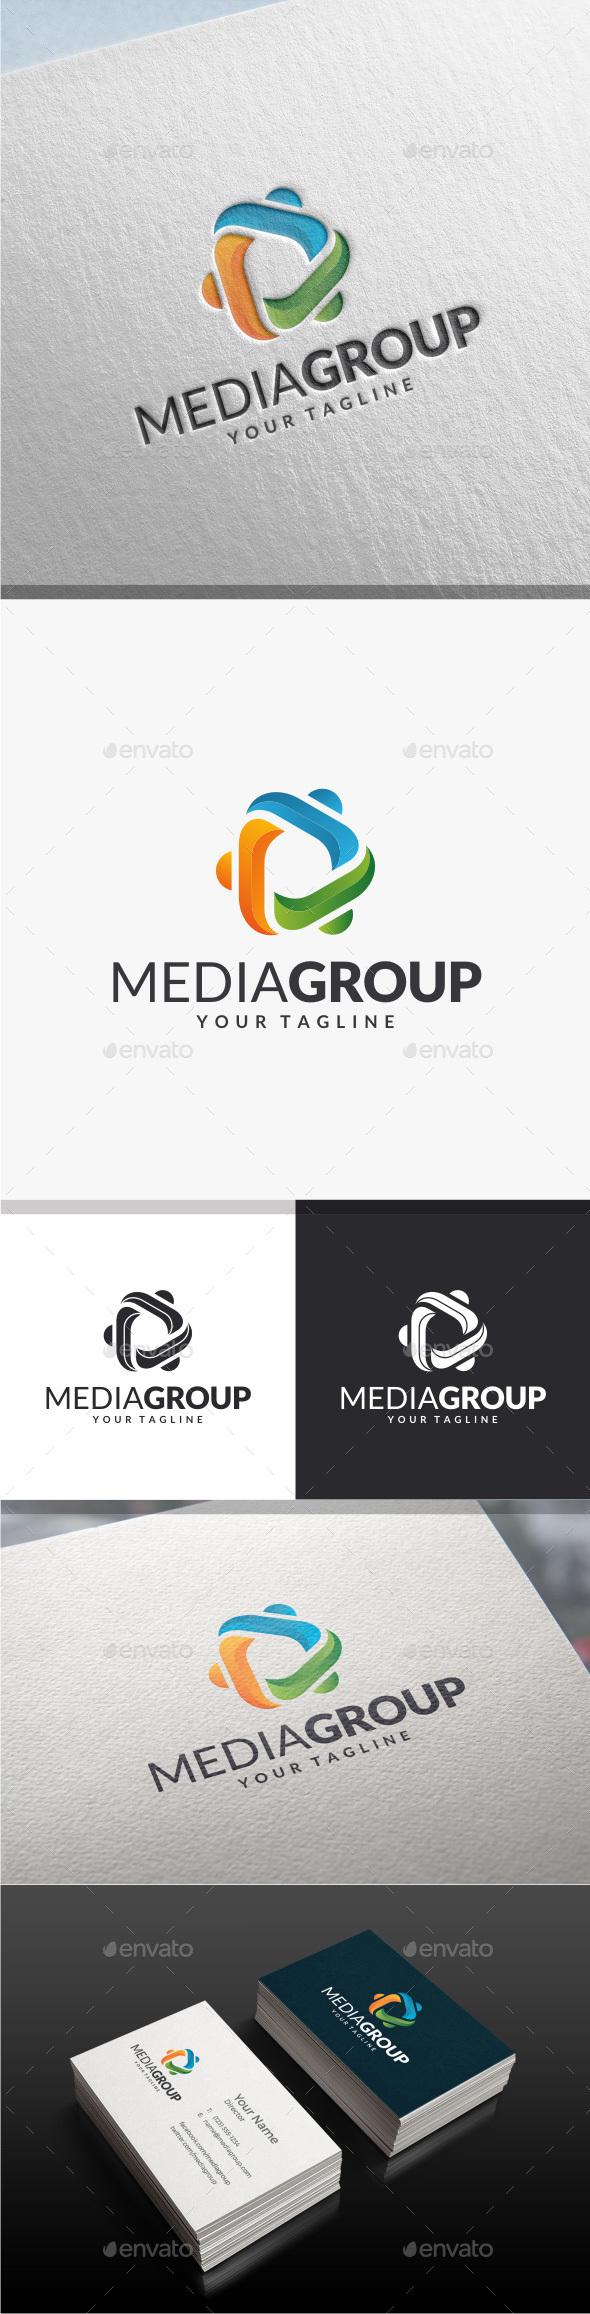 Media Group Logo - Abstract Logo Templates